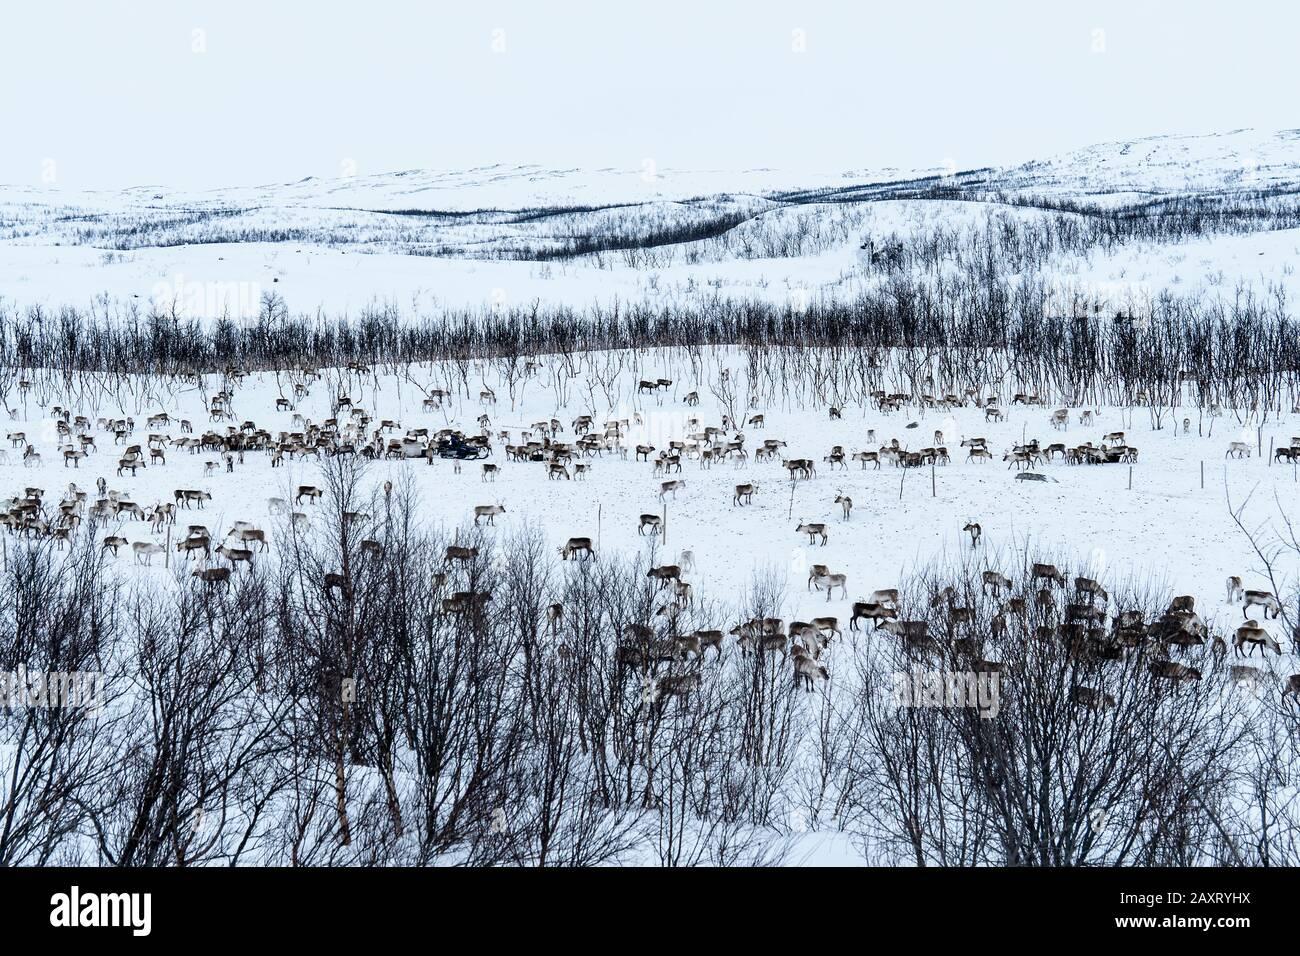 Lapland, snowy landscape, reindeer herding Stock Photo